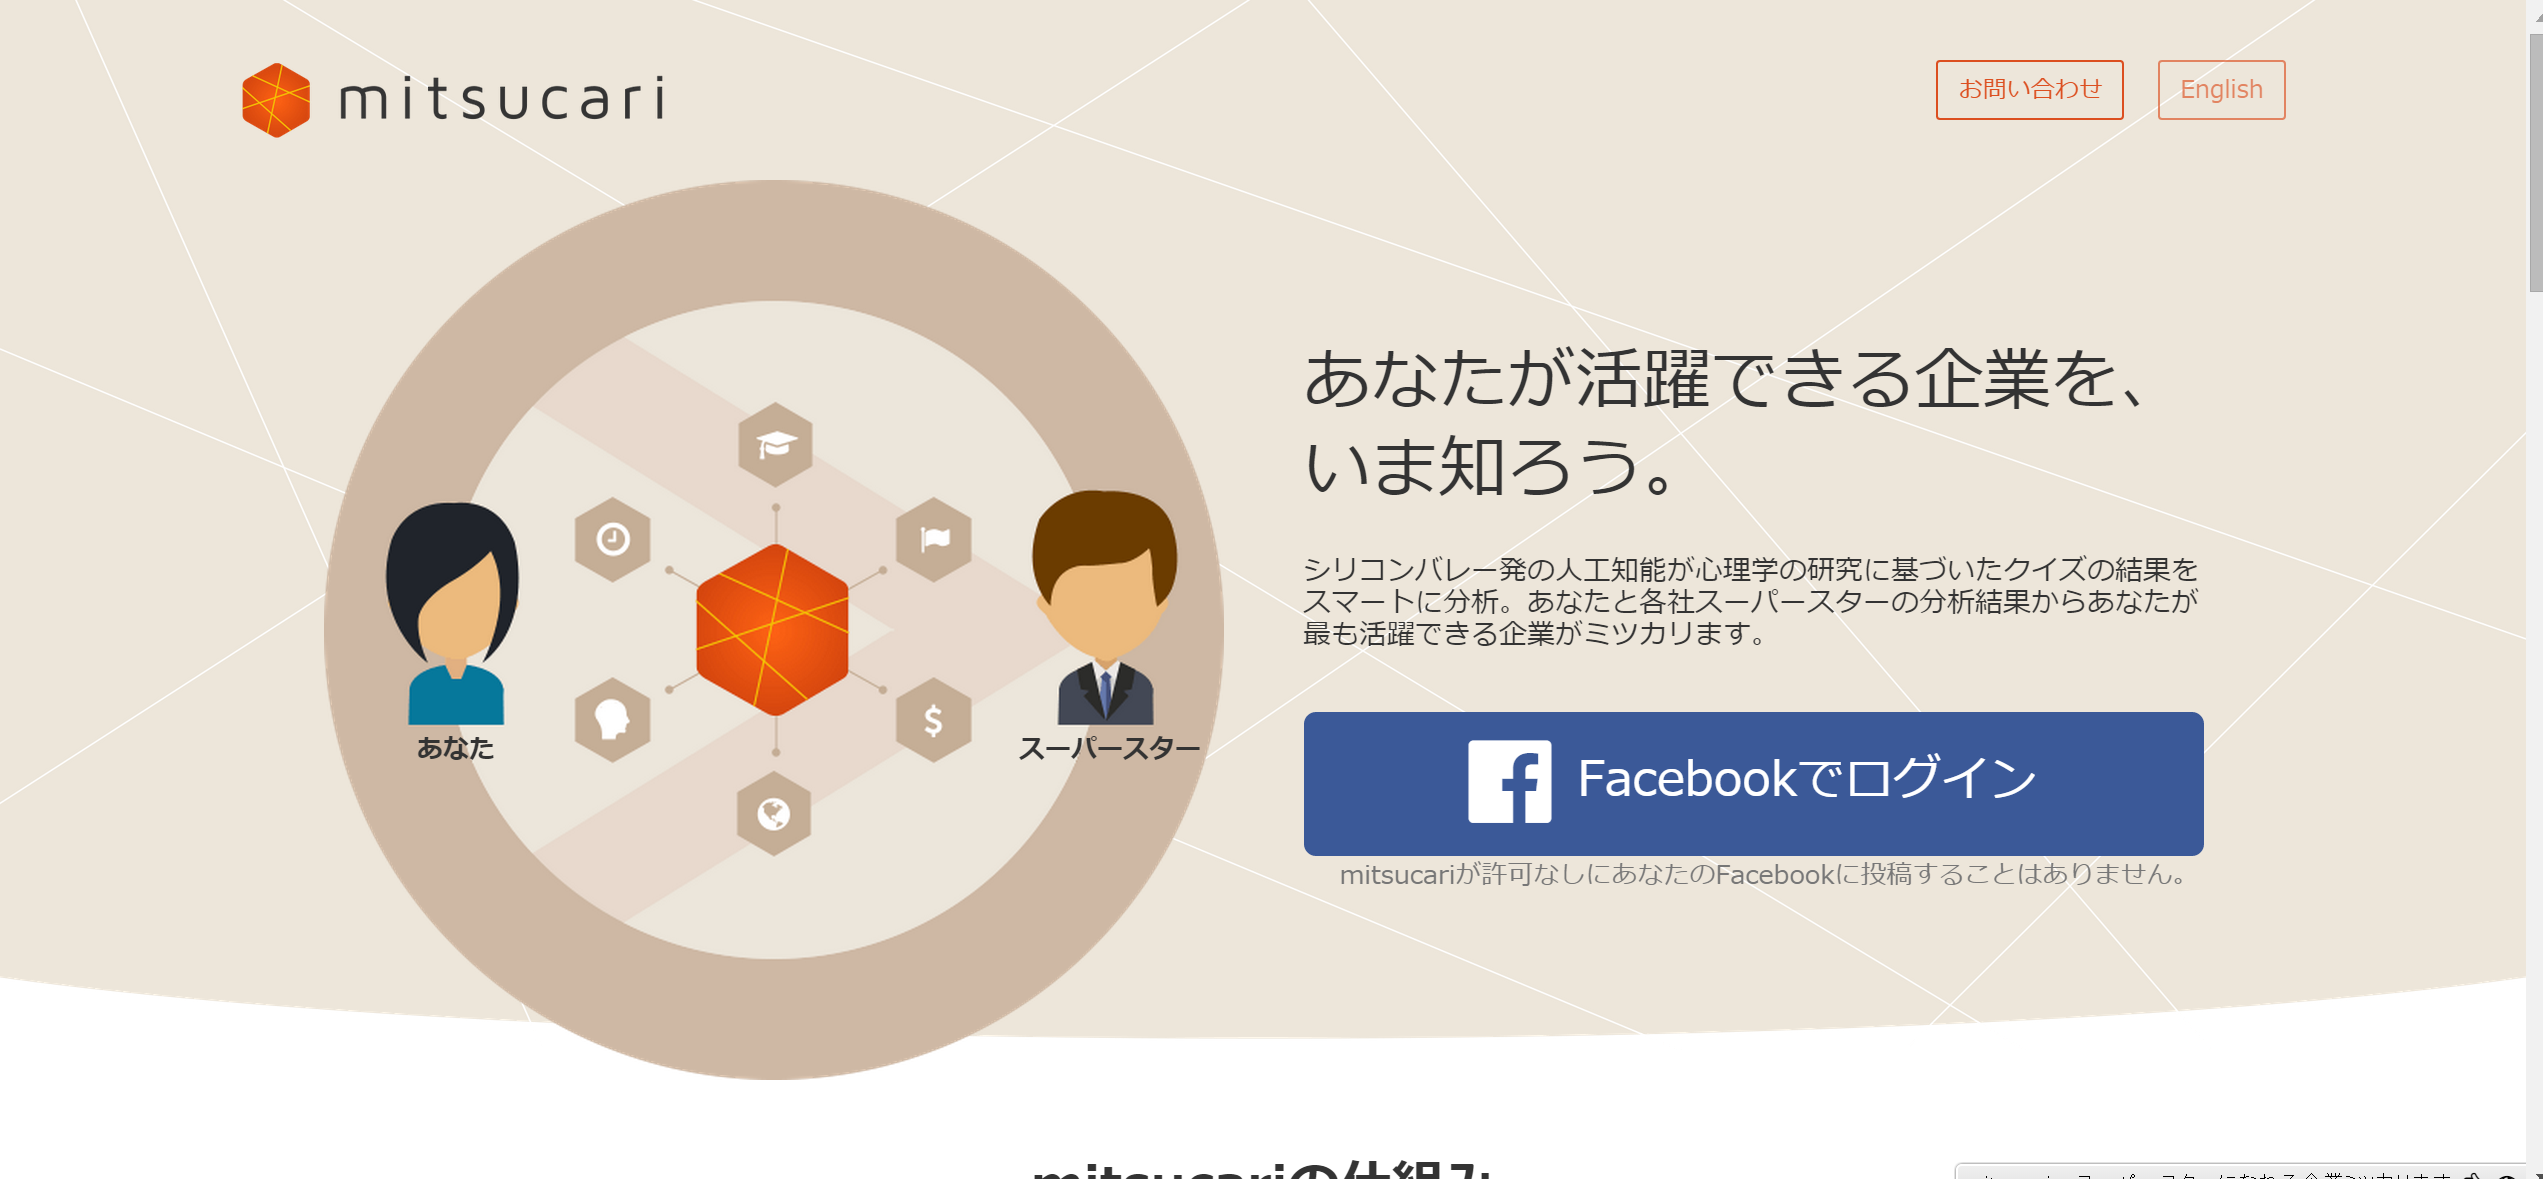 mitsucari スーパースターになれる企業ミツカリます